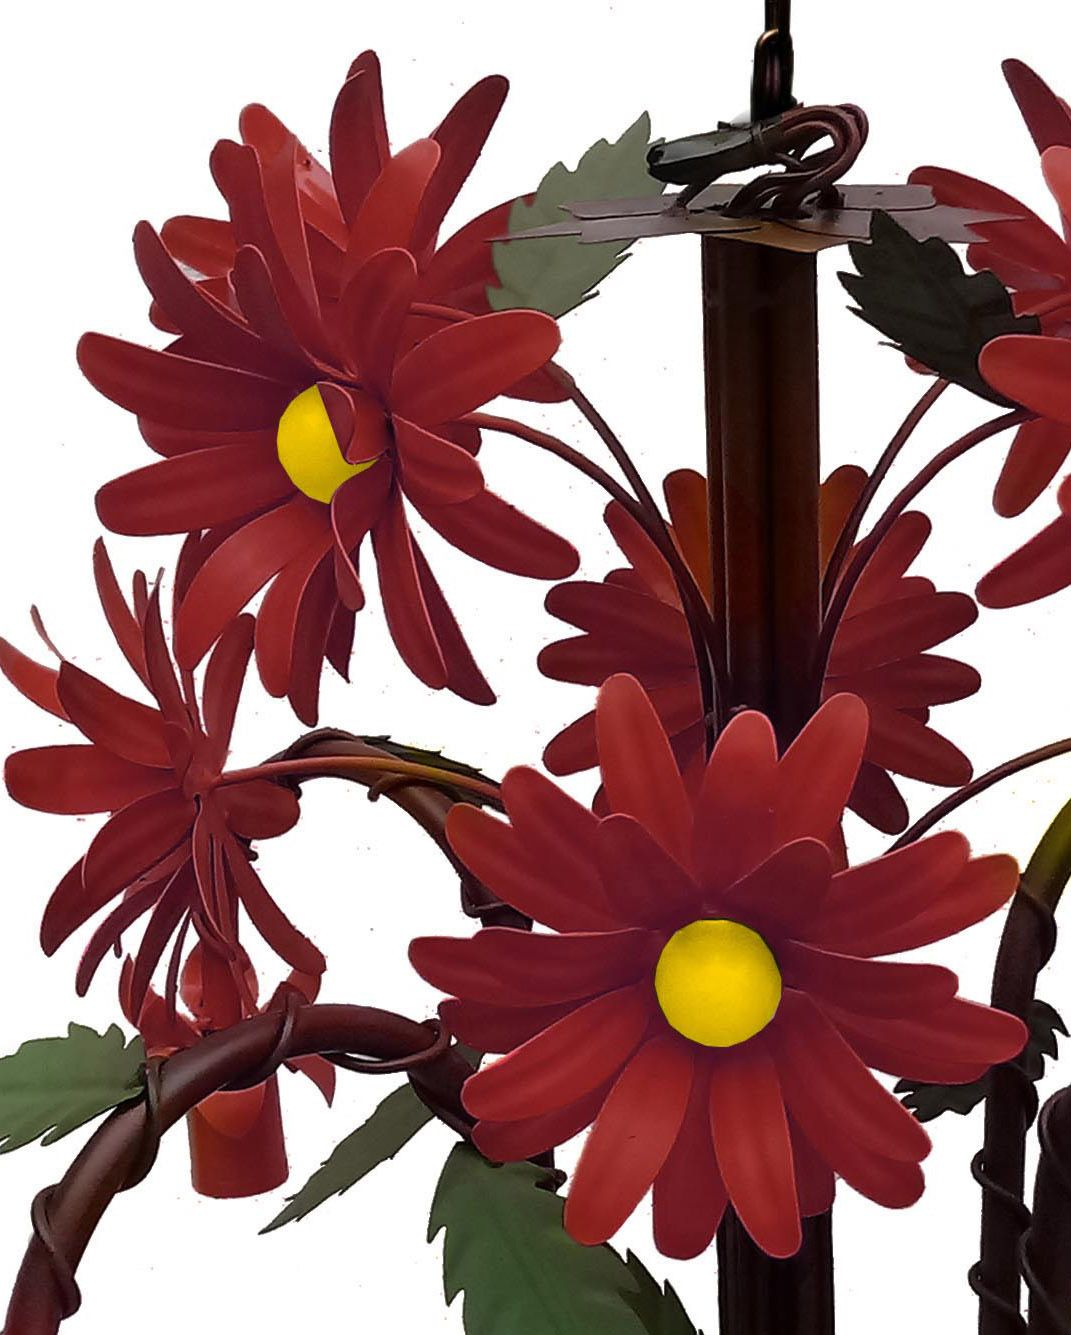 Pendente Lustre de Flores Coloridas Artesanal para Quarto de Casal Grande